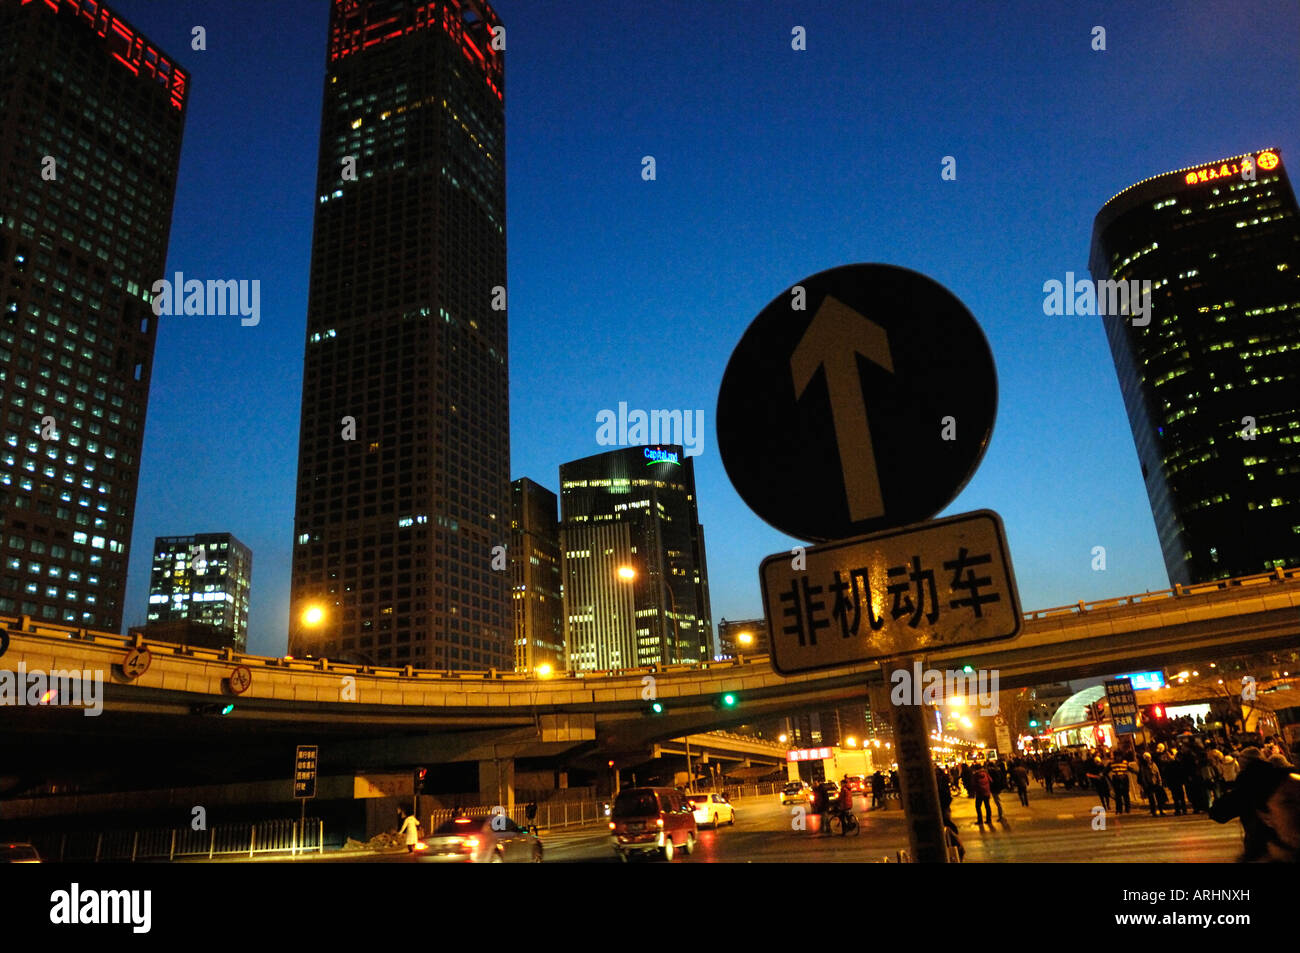 Beijing CBD. 14-Feb-2008 - Stock Image